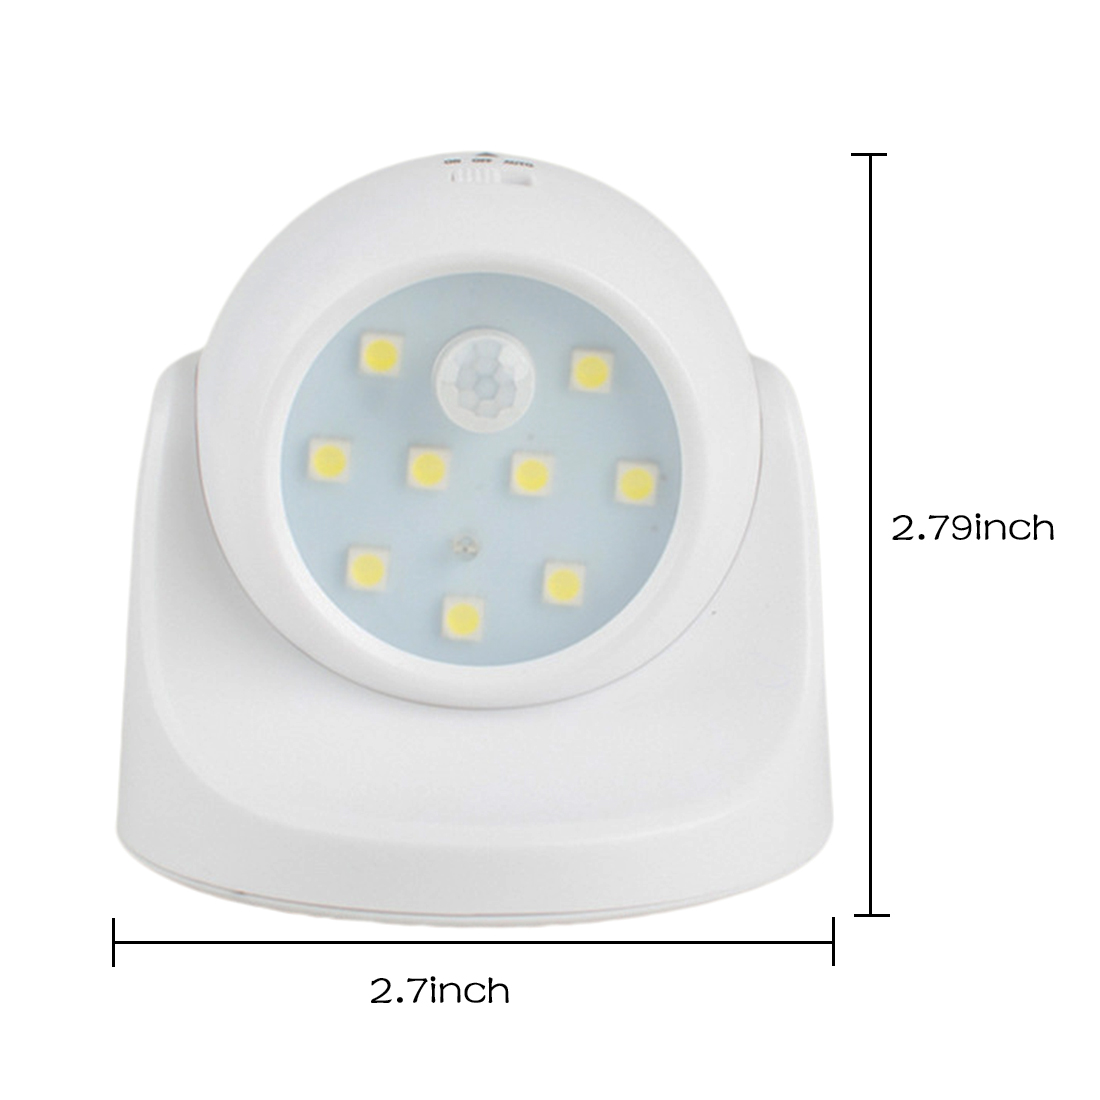 Hot 9 LED Motion Sensor Night Light 360 Degree Rotation Portable Night Light Auto IR Infrared Luminary Lamp Children Lamp LED